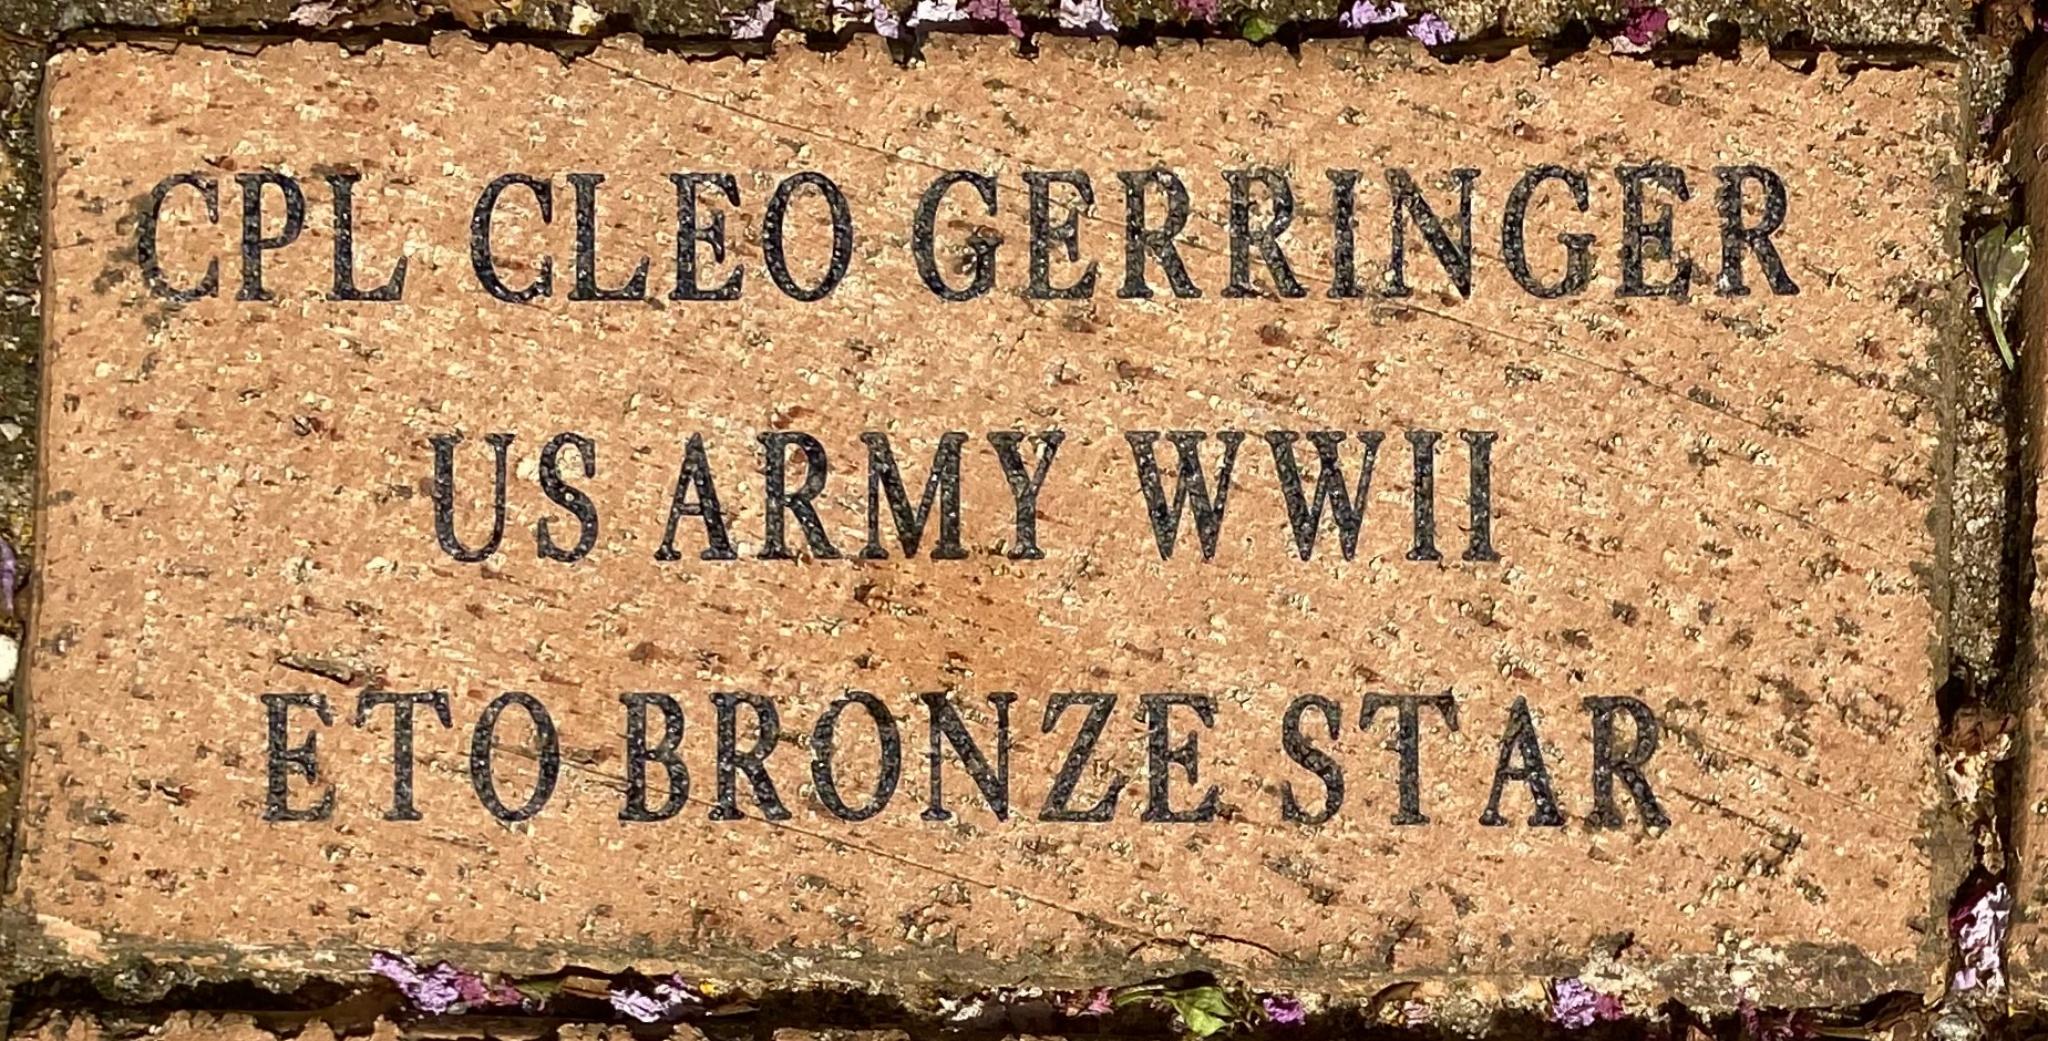 CPL CLEO GERRINGER US ARMY WWII ETO BRONZE STAR